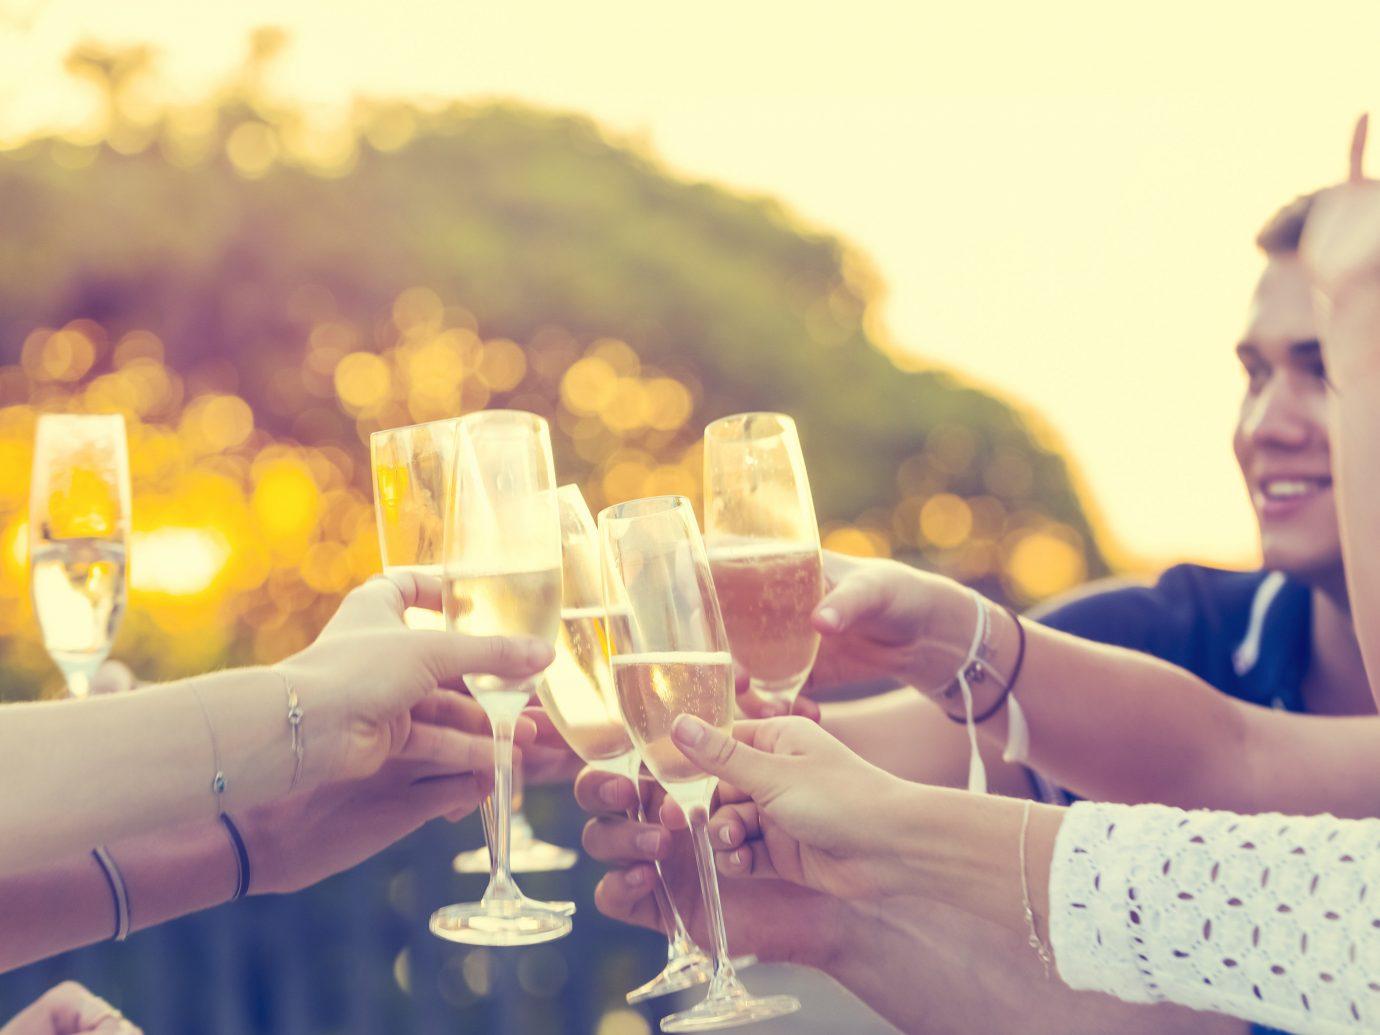 Solo Travel Trip Ideas person color wedding ceremony sense hand Romance